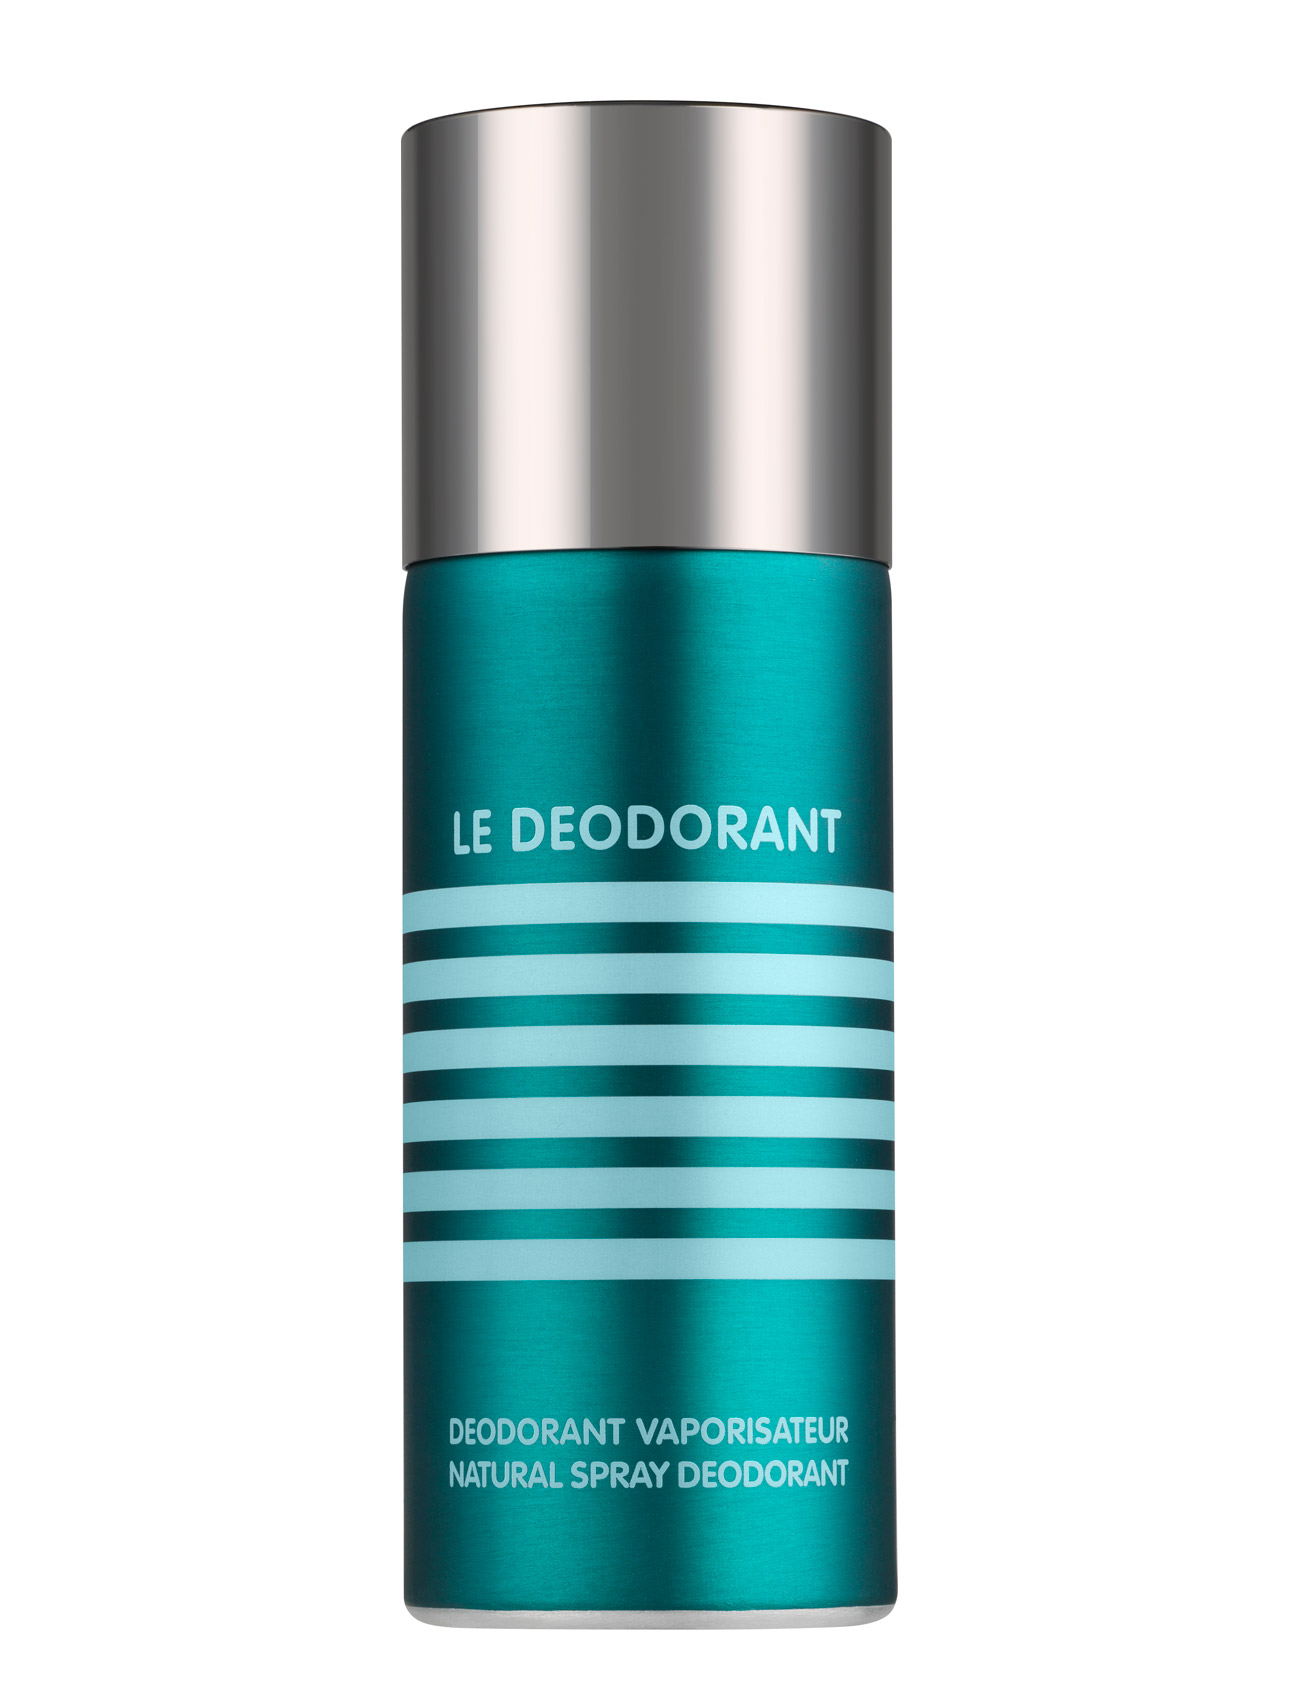 jean paul gaultier Le male deodoran på boozt.com dk